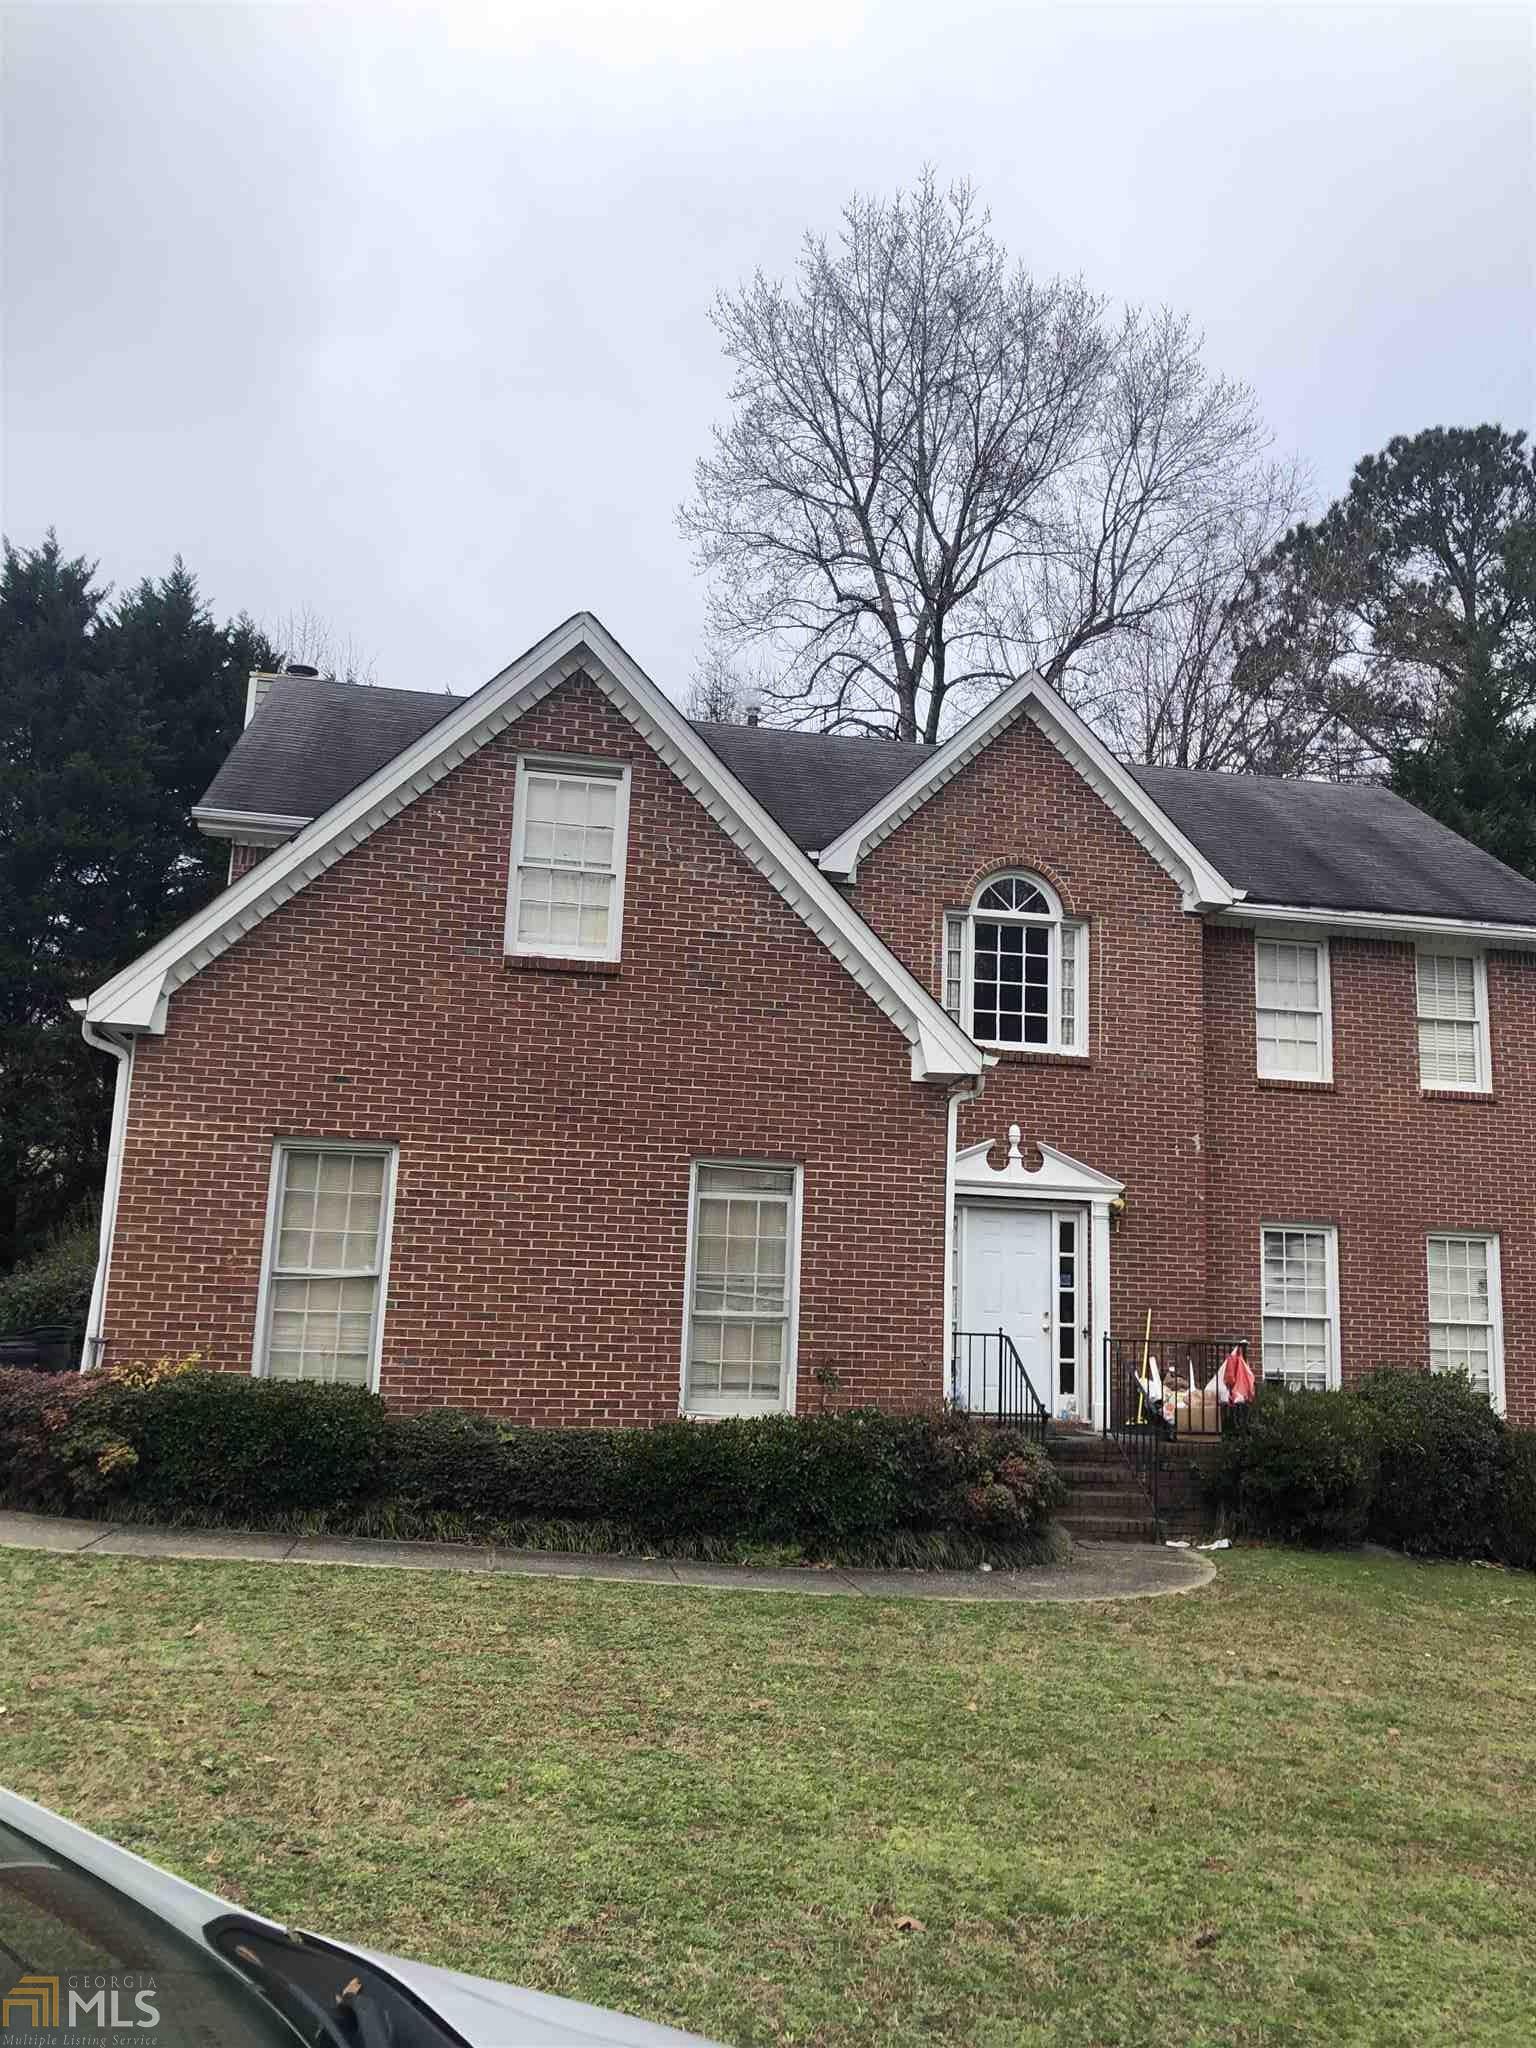 404 Rams Ct, Tucker, Georgia 30084, 4 Bedrooms Bedrooms, ,4 BathroomsBathrooms,Single Family,For Sale,404 Rams Ct,2,8910889